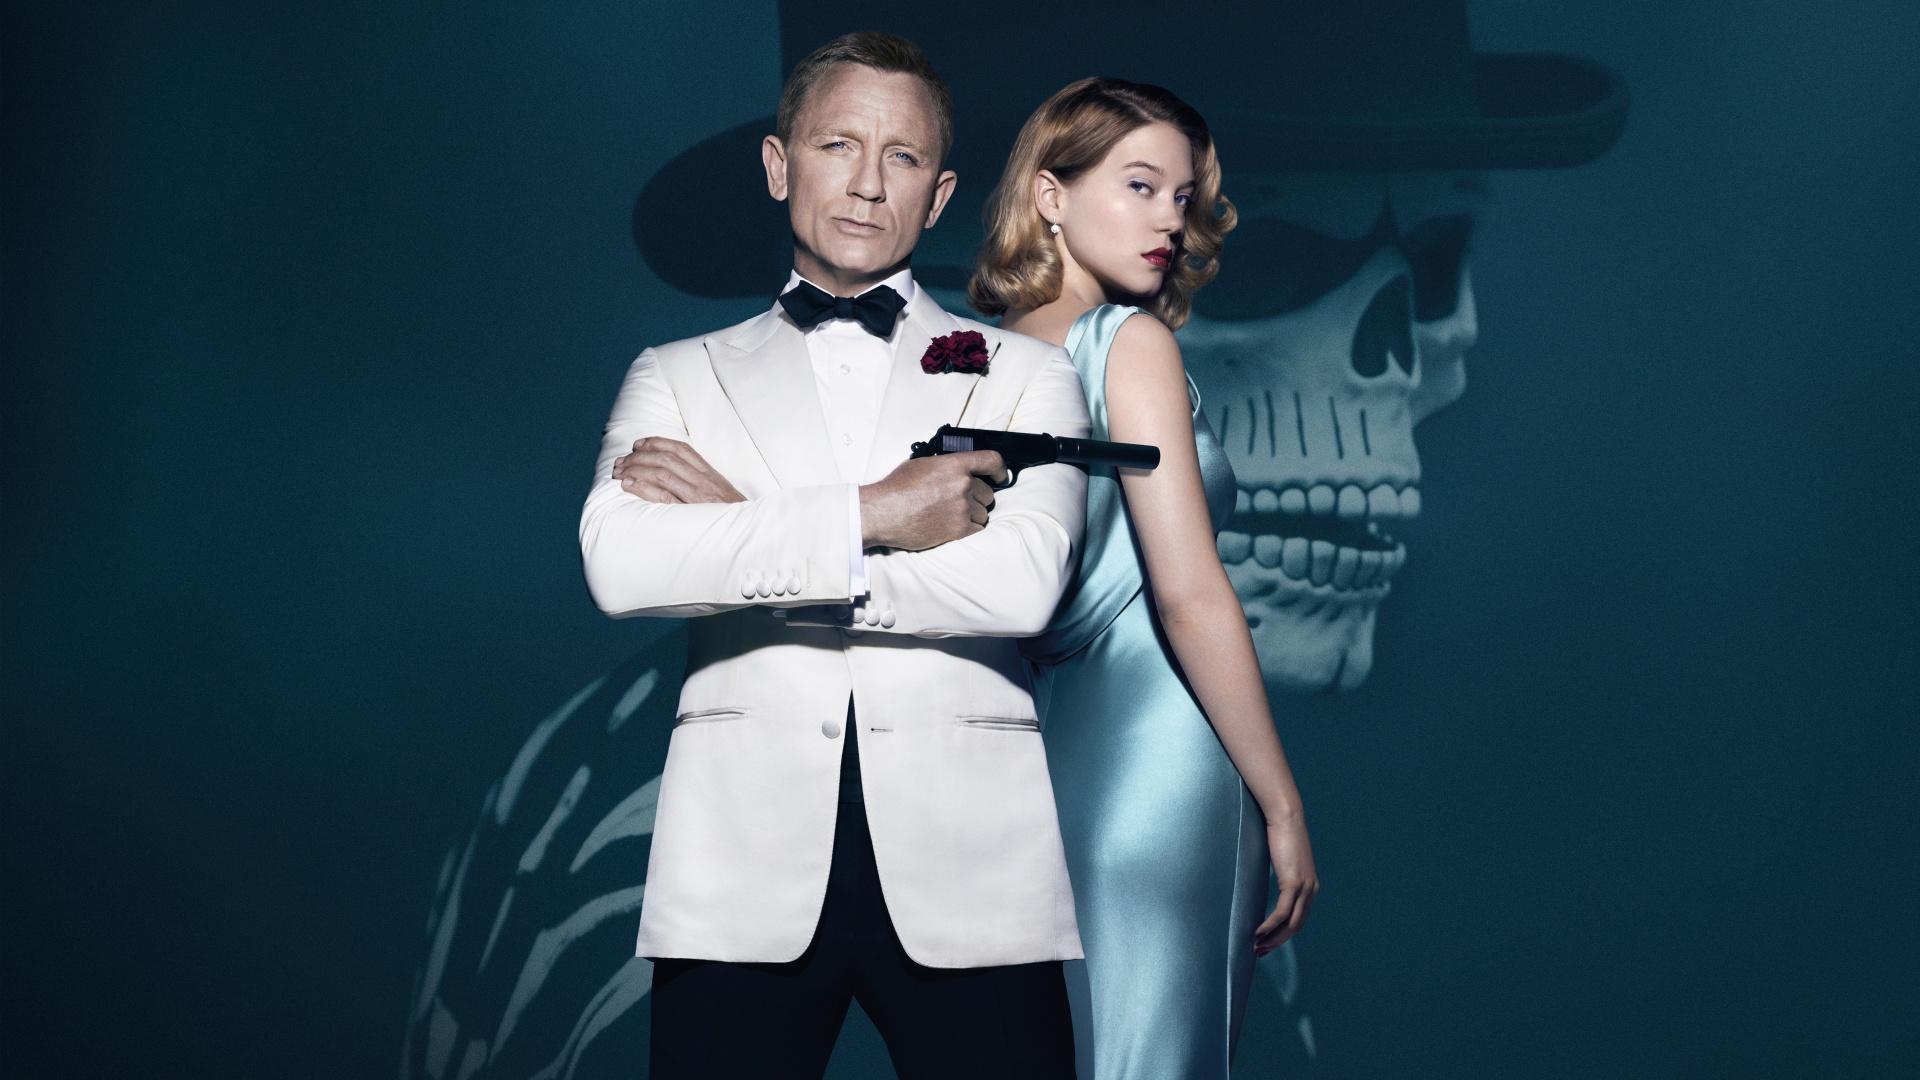 James Bond Spectre wallpapers 1920x1080